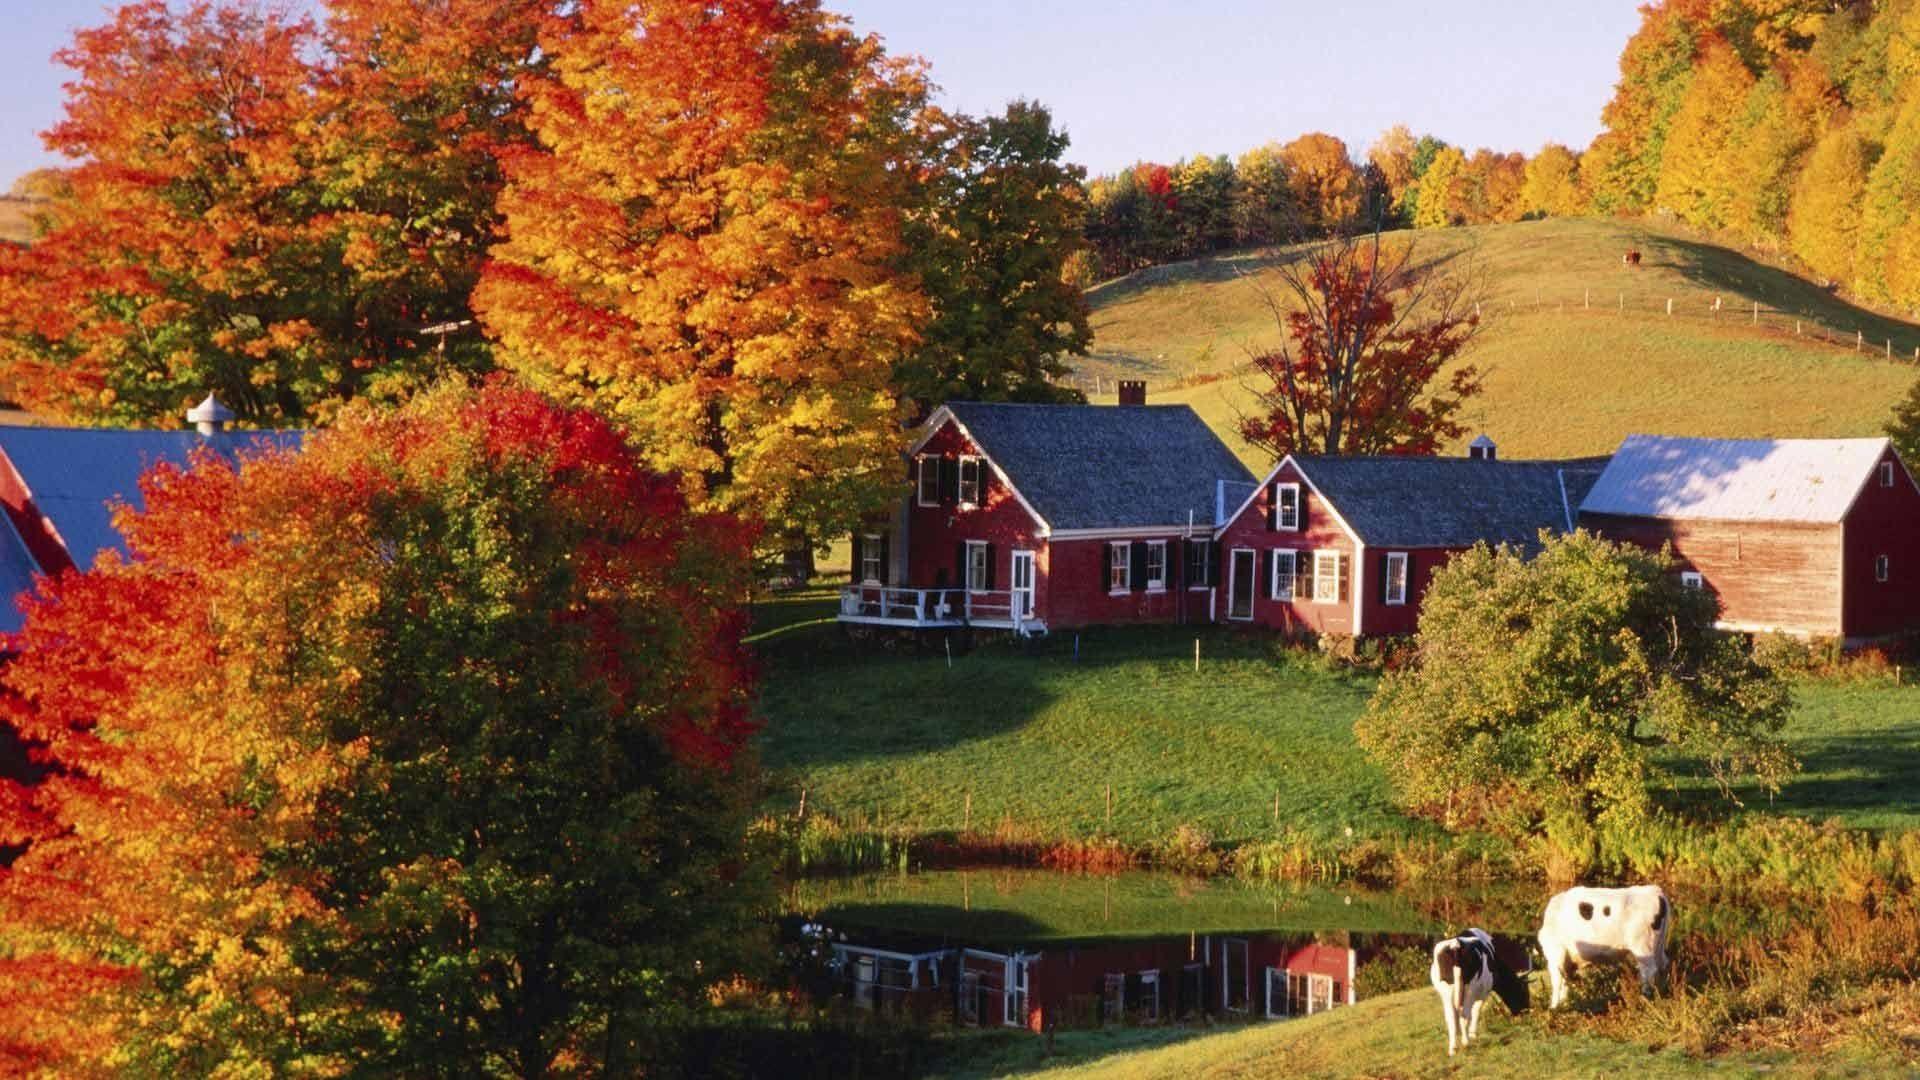 Autumn Wallpaper For Desktop 61 Pictures